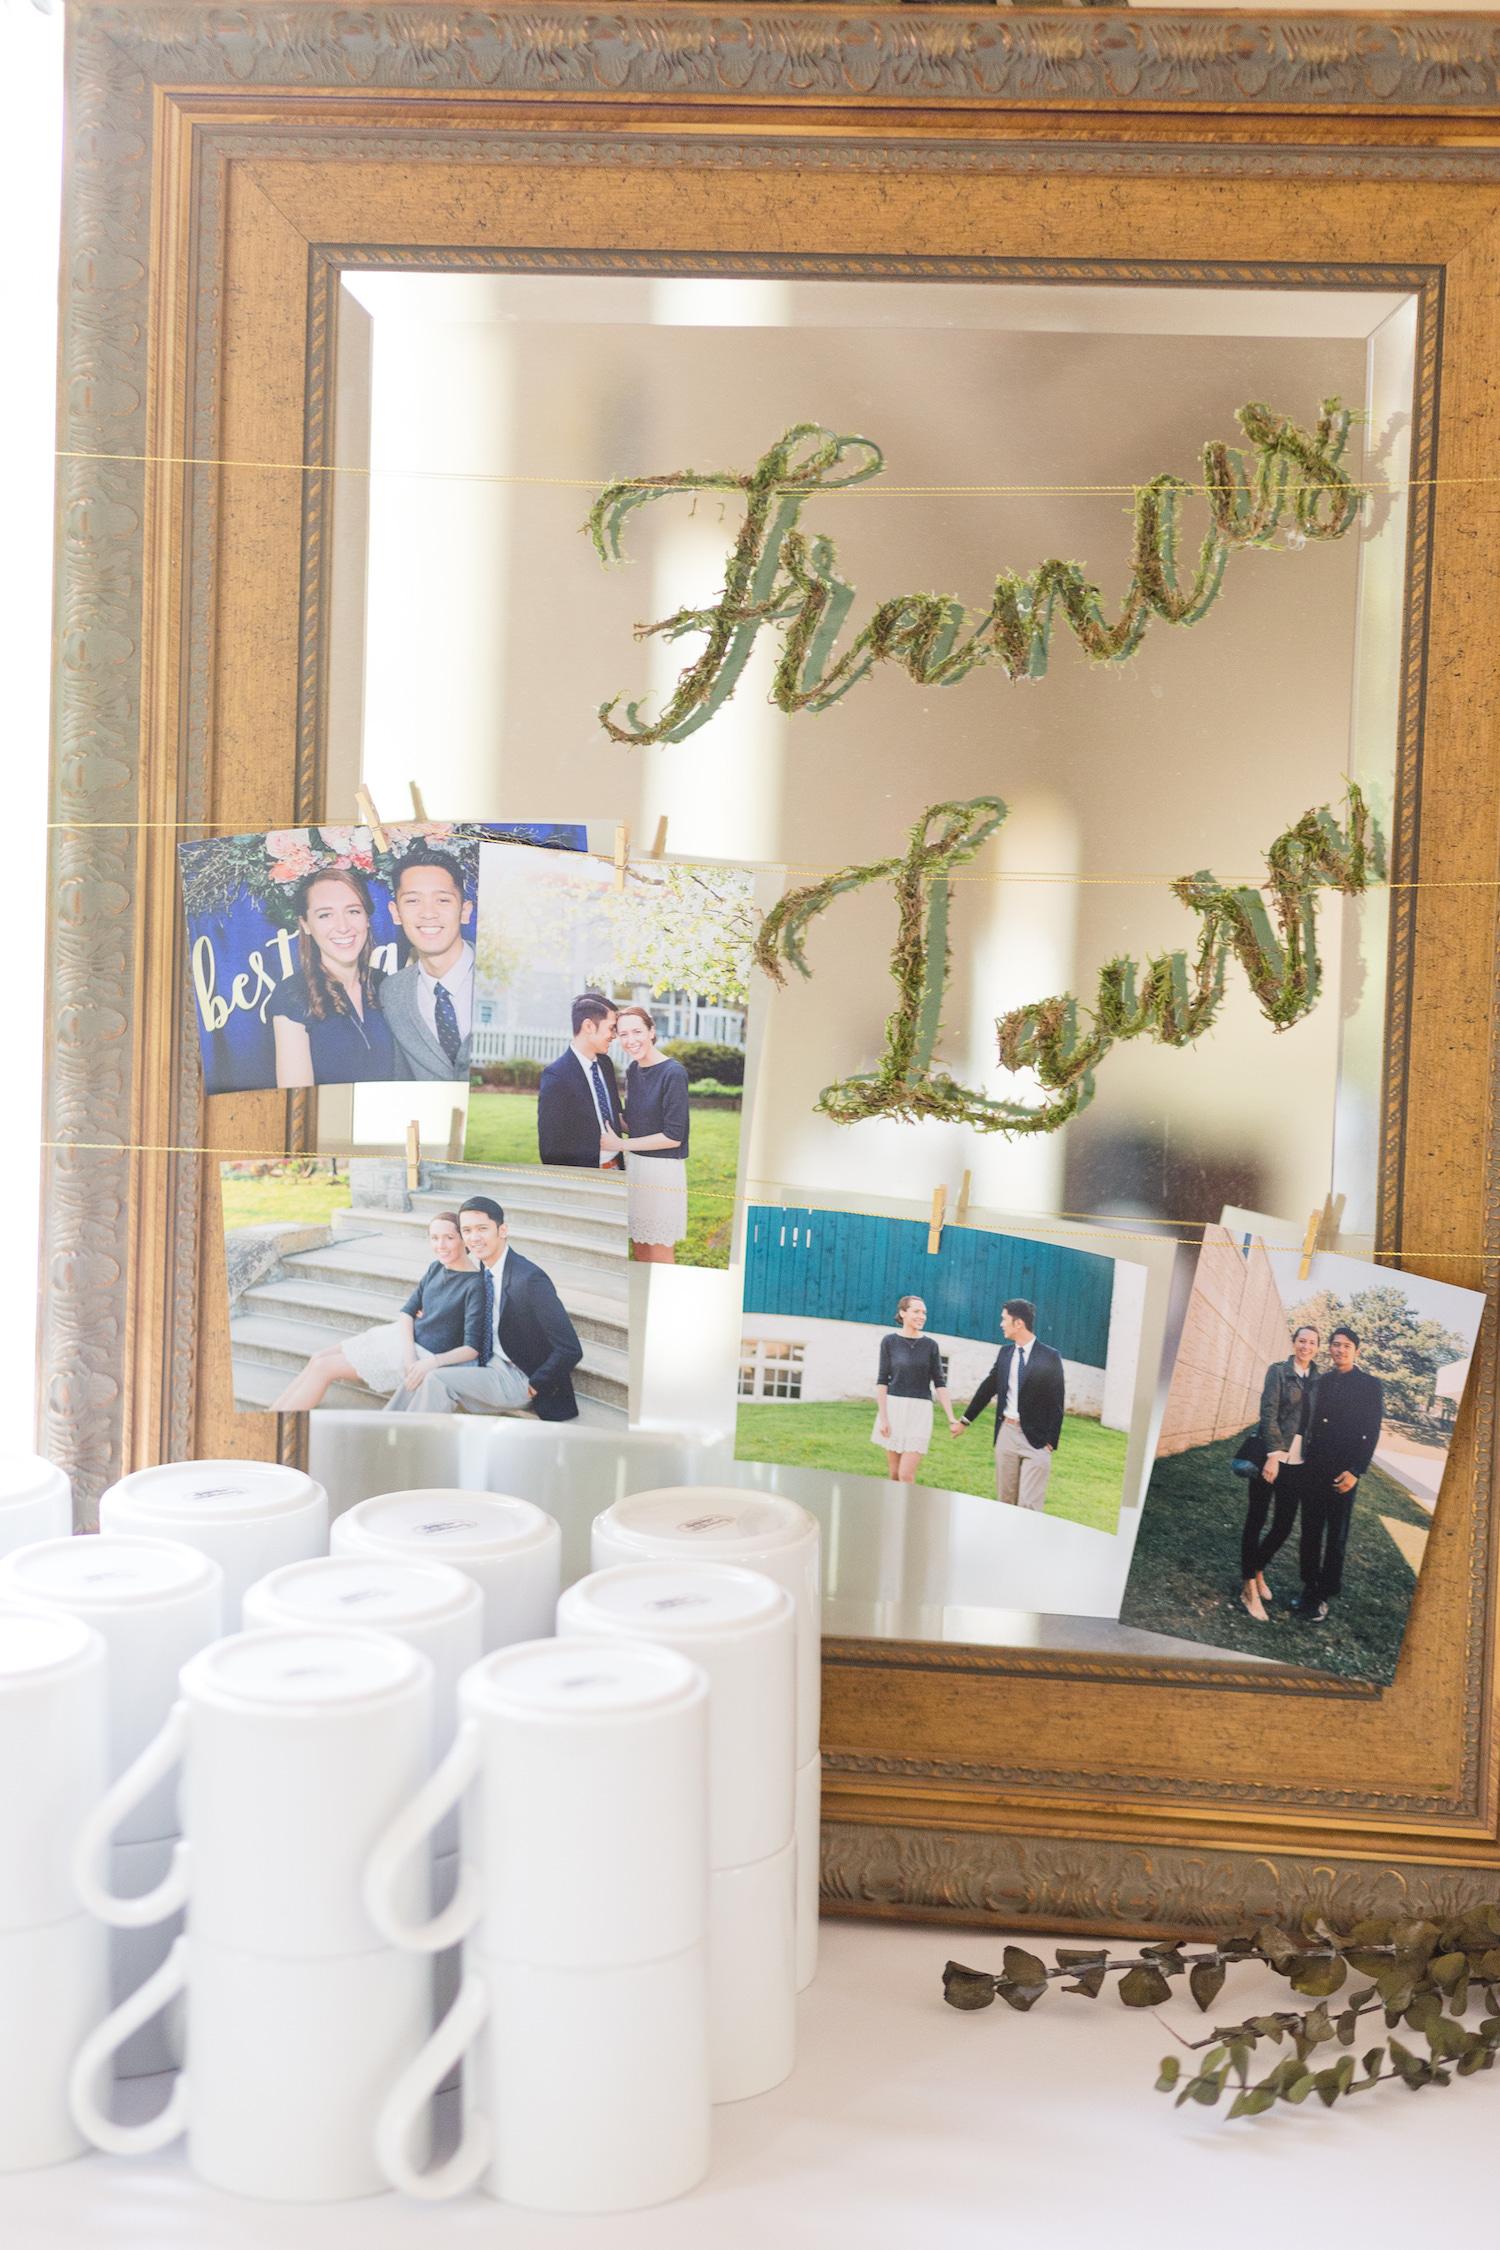 laura-vidal-design-wedding-decor.jpg